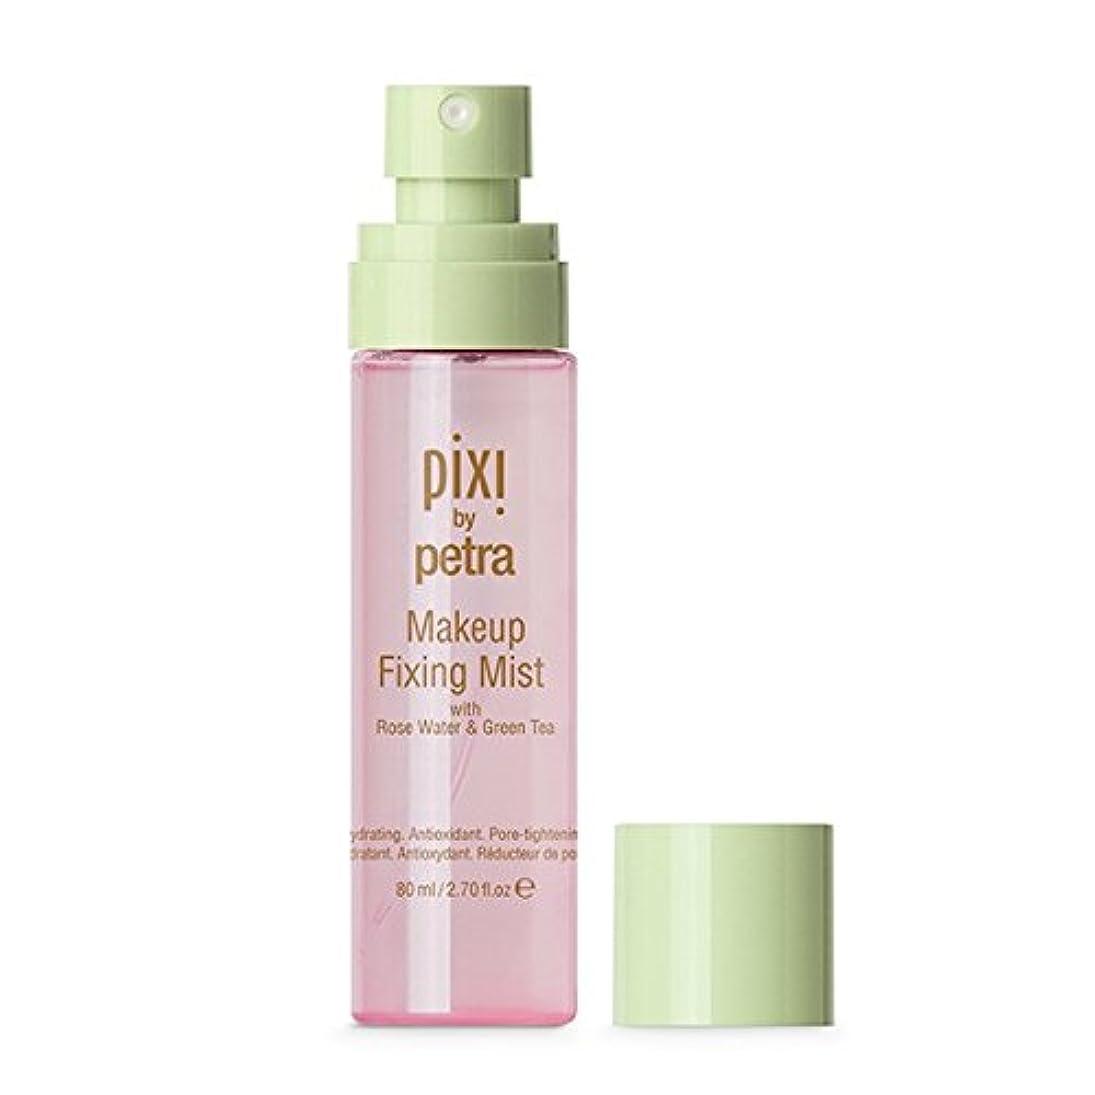 襟実行可能透けるPixi Makeup Fixing Mist (並行輸入品) [並行輸入品]